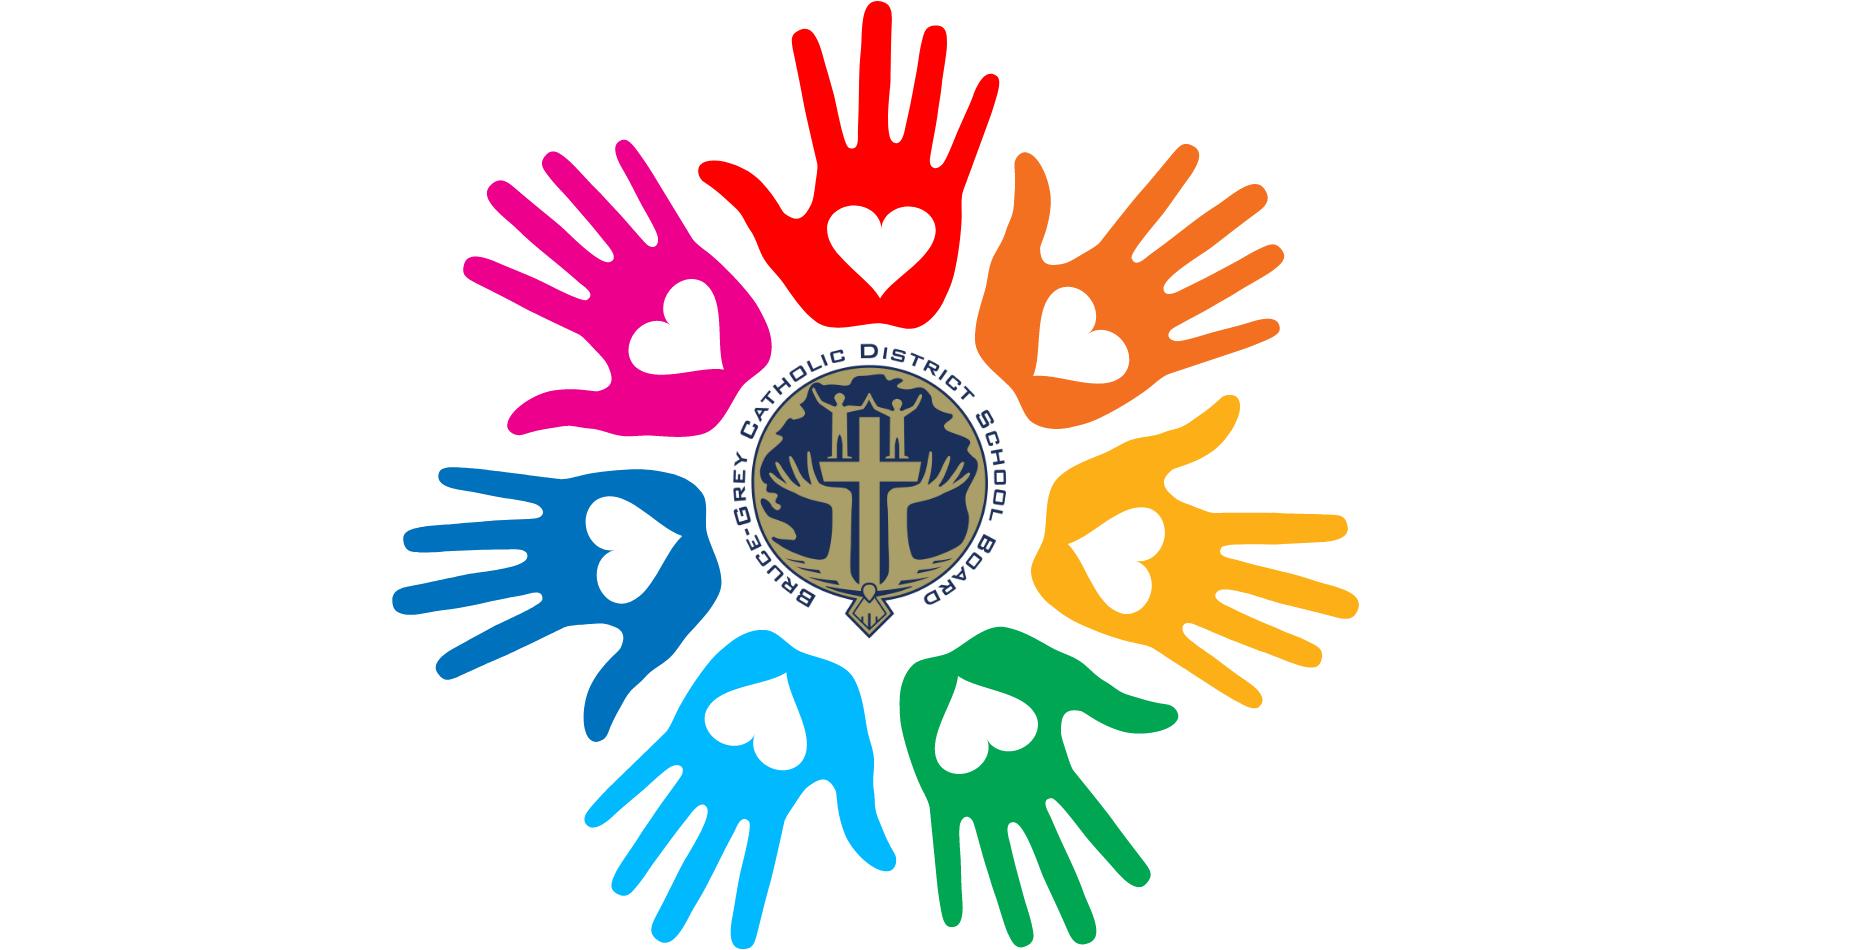 BGCDSB logo with multi-coloured hands surrounding it.